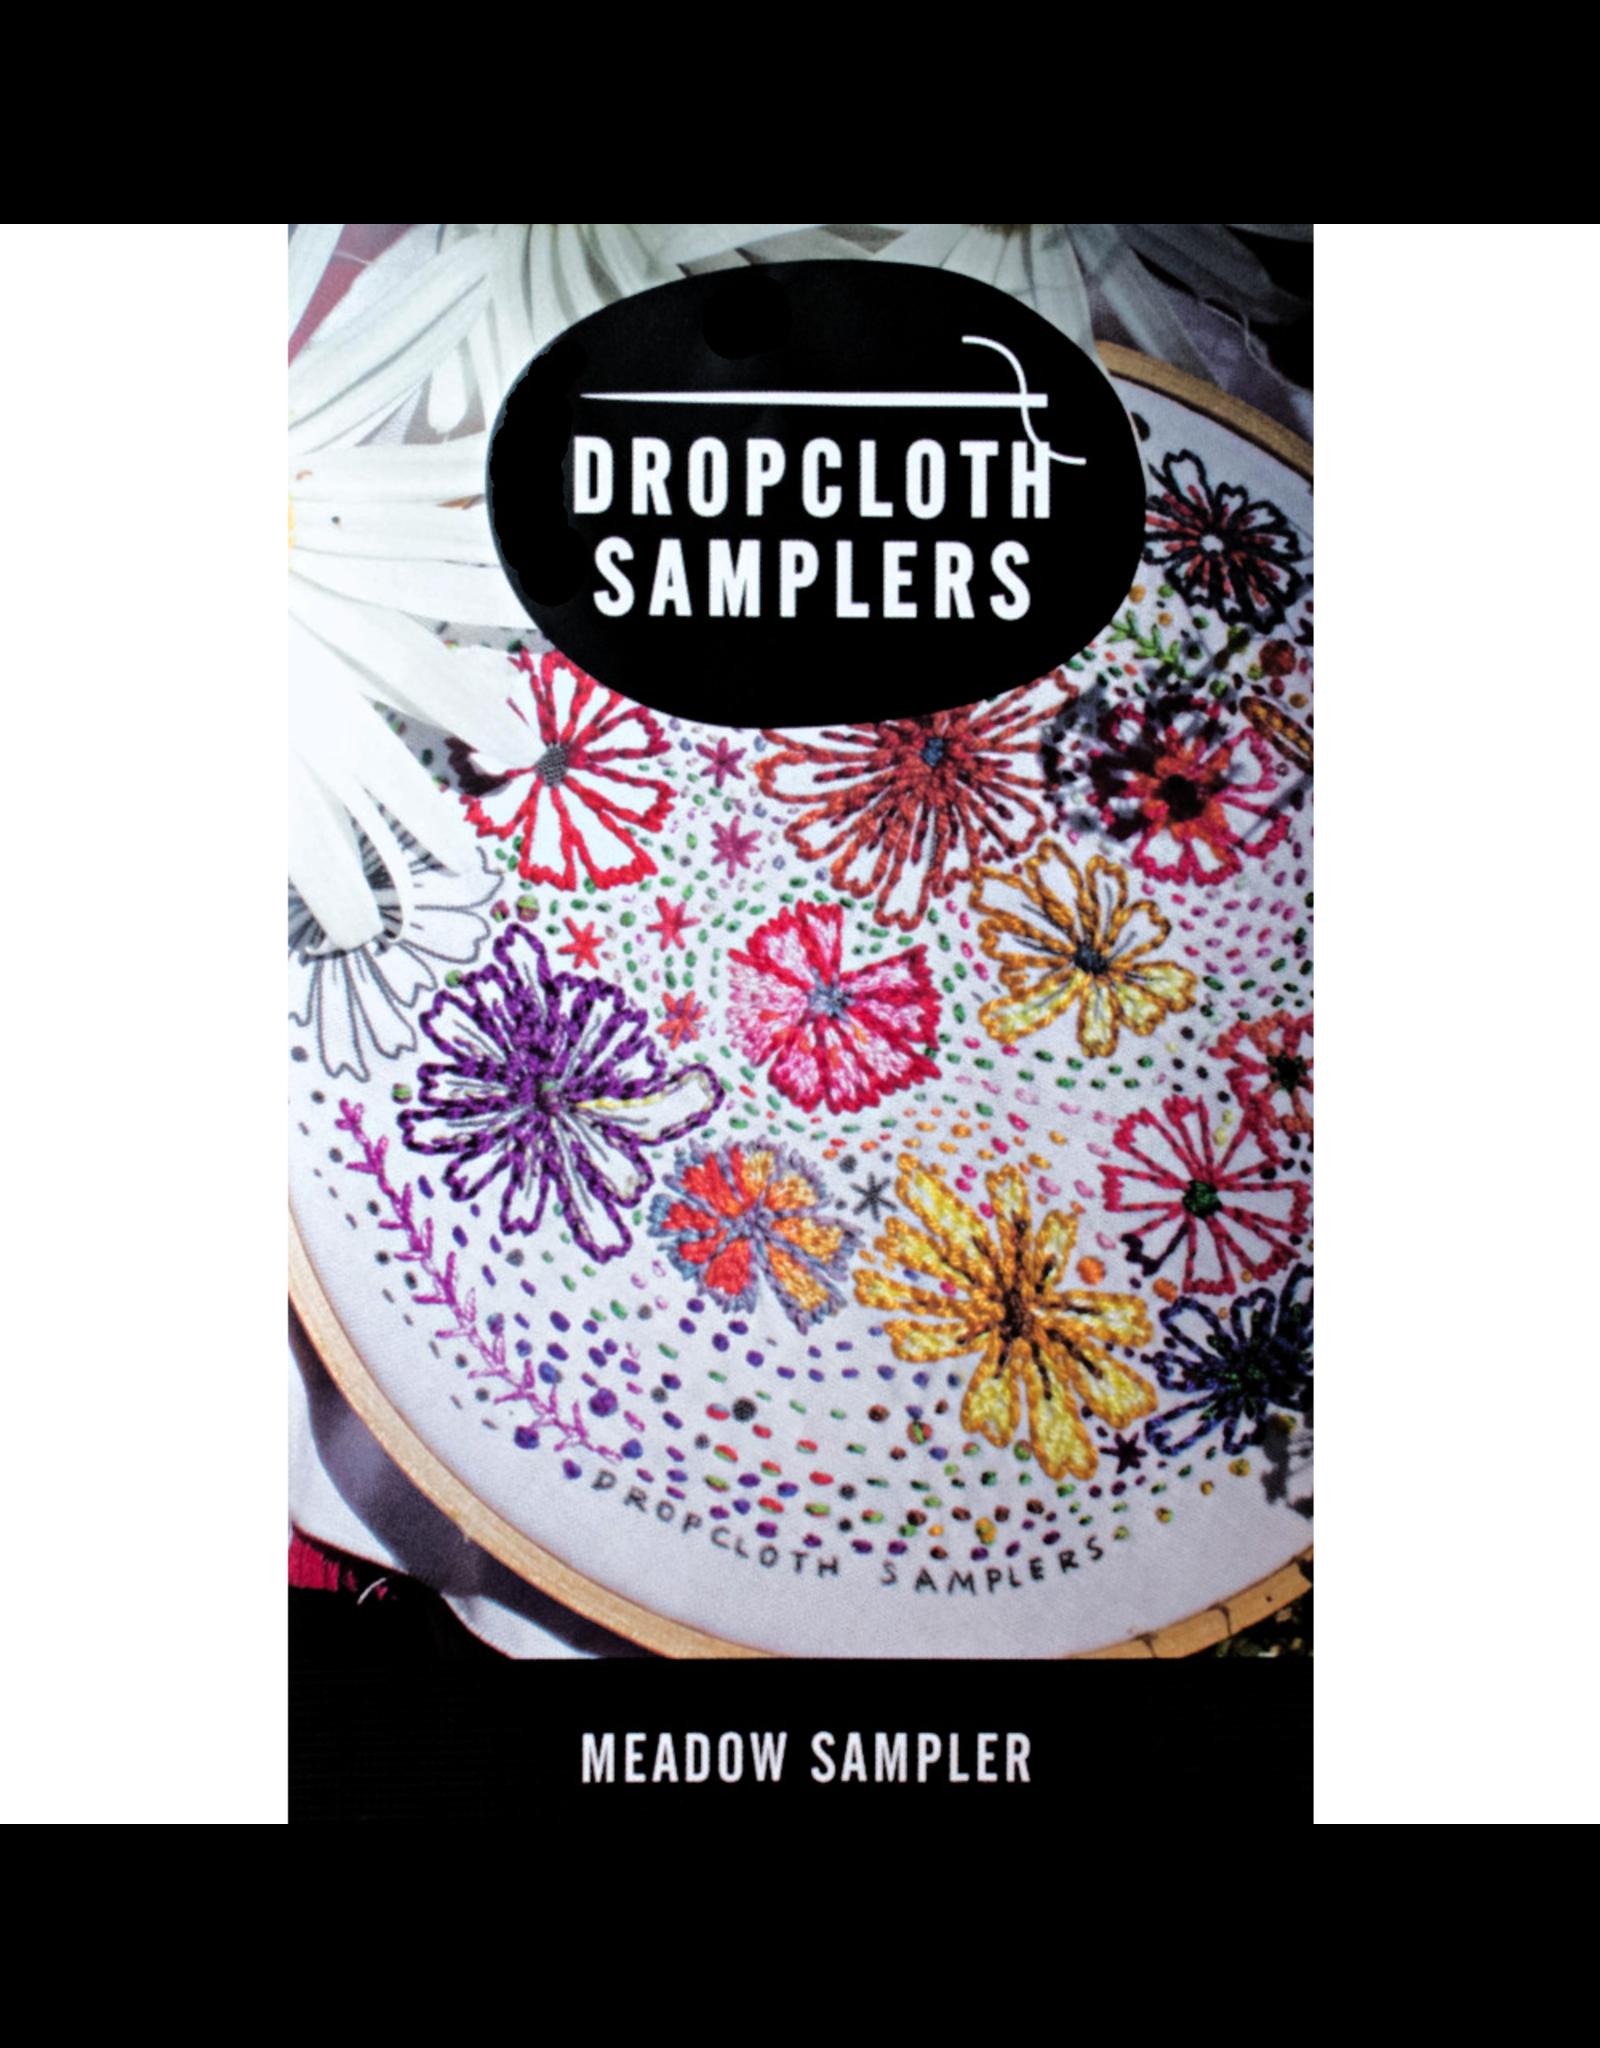 Dropcloth Samplers Meadow Sampler,  Embroidery Sampler from Dropcloth Samplers